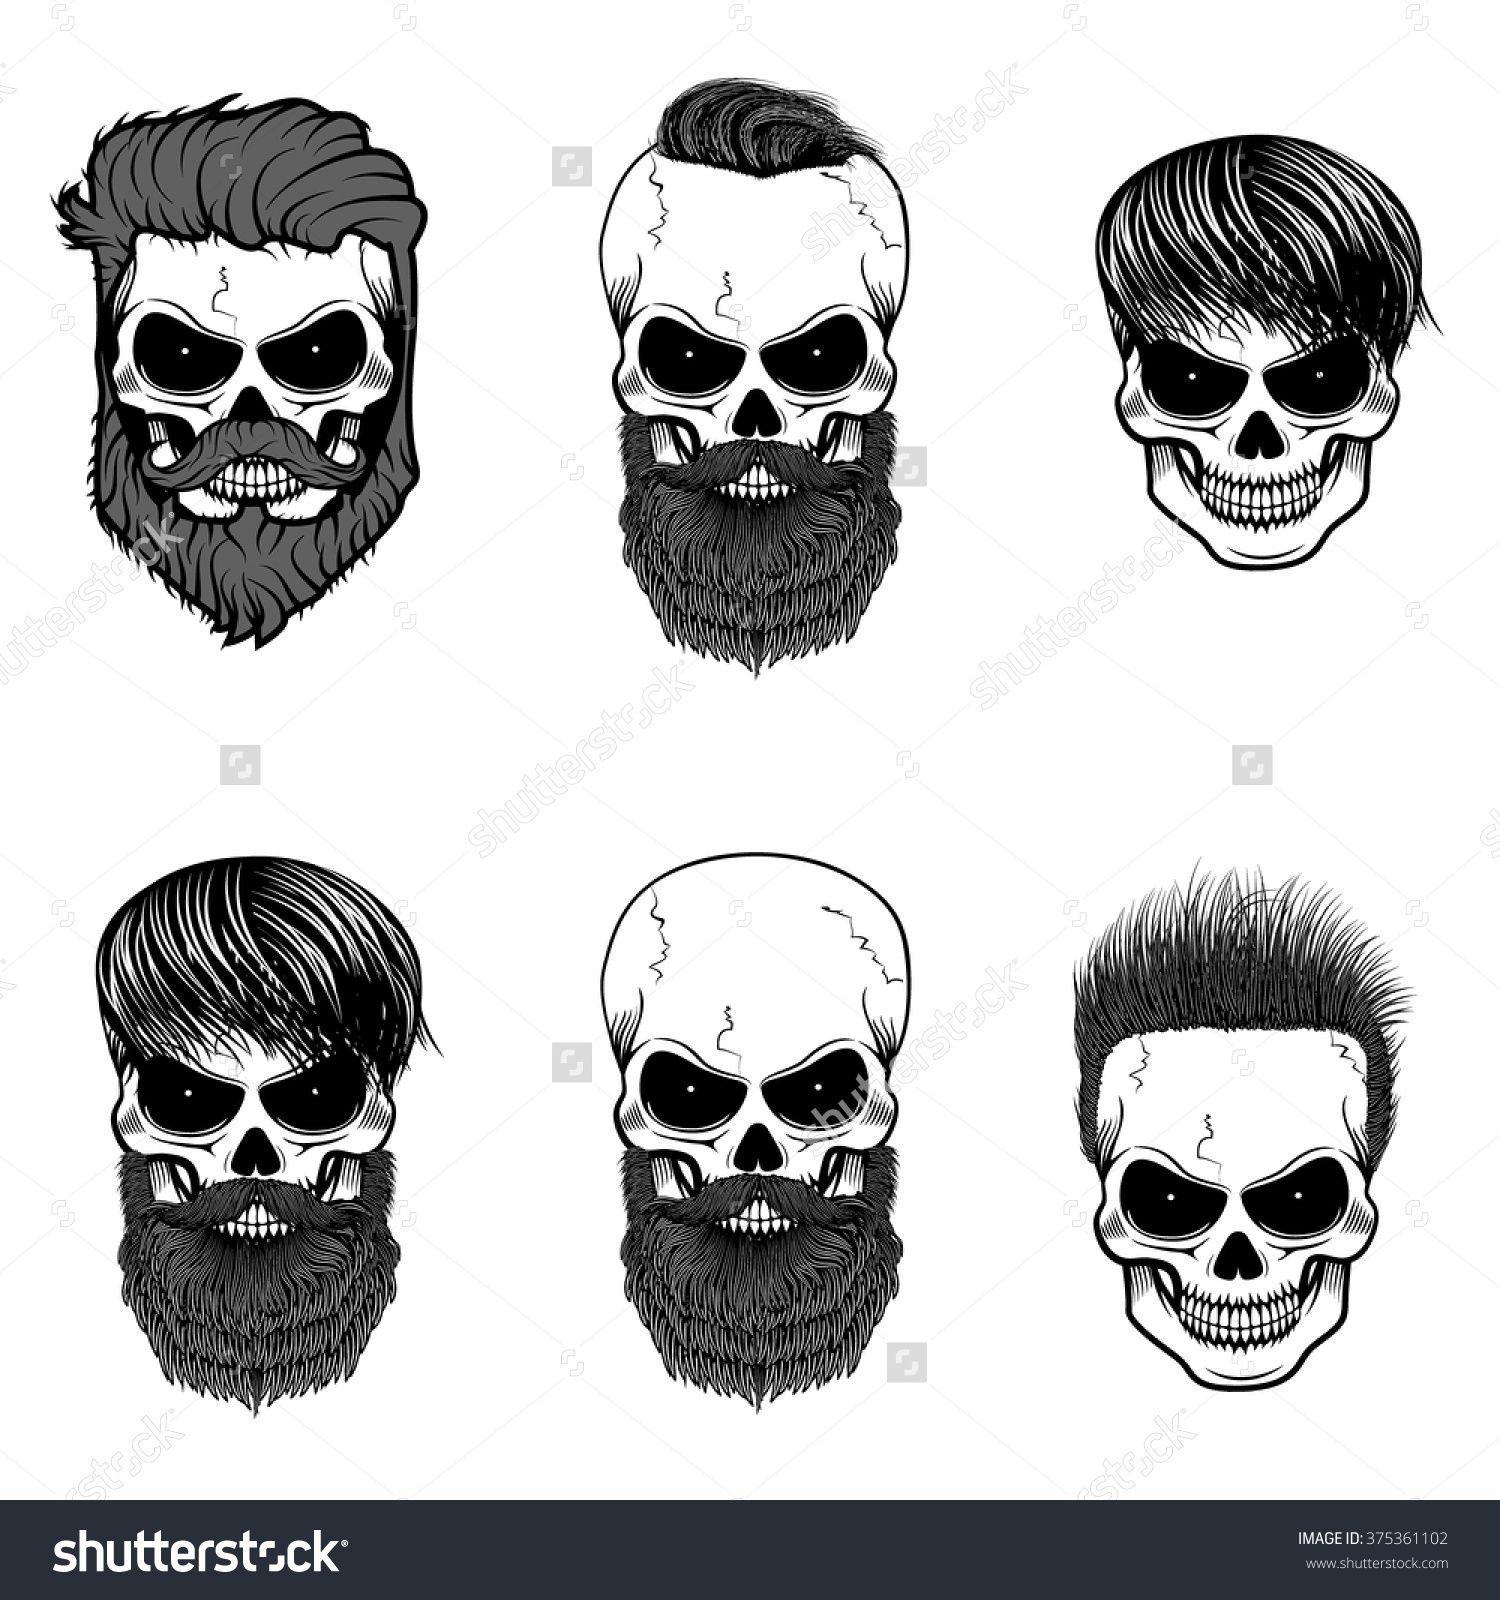 Shirt design elements - Set Of Bearded Skulls Skulls With Beard And Hair Vector Design Elements For Label